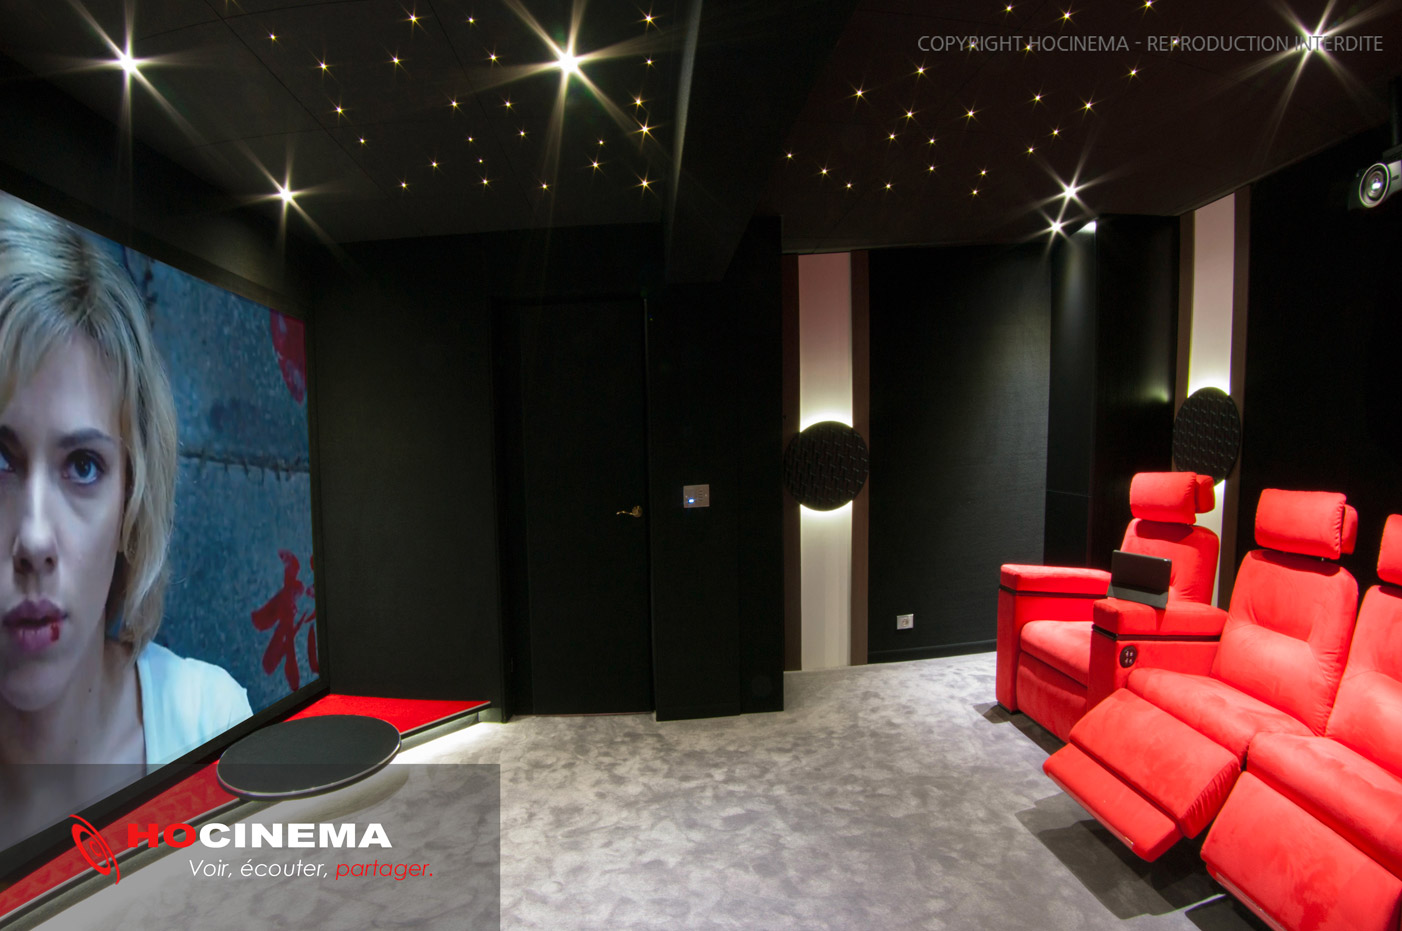 Deco Salle De Cinema Awesome Deco Salle Theme Cinema Deco